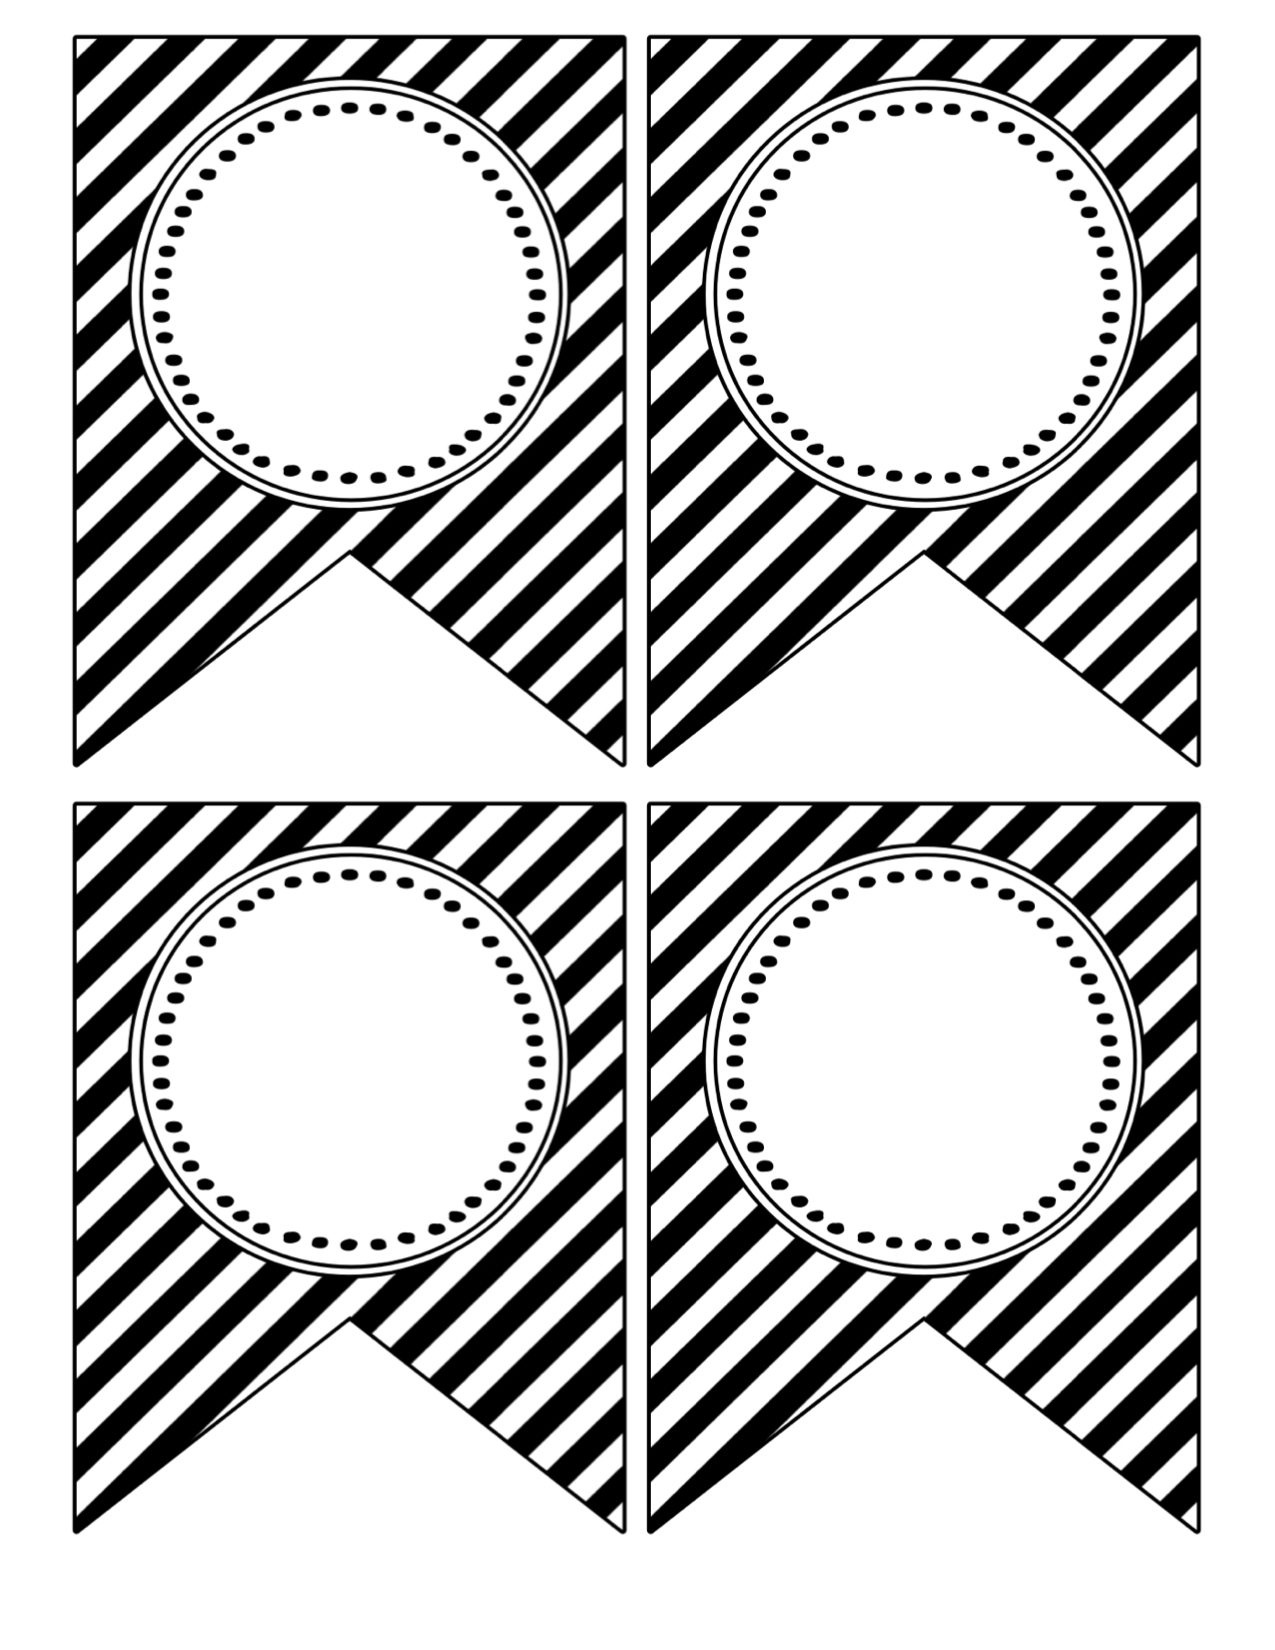 Printable Birthday Banner Template Black And White   Theveliger - Birthday Banner Templates Free Printable